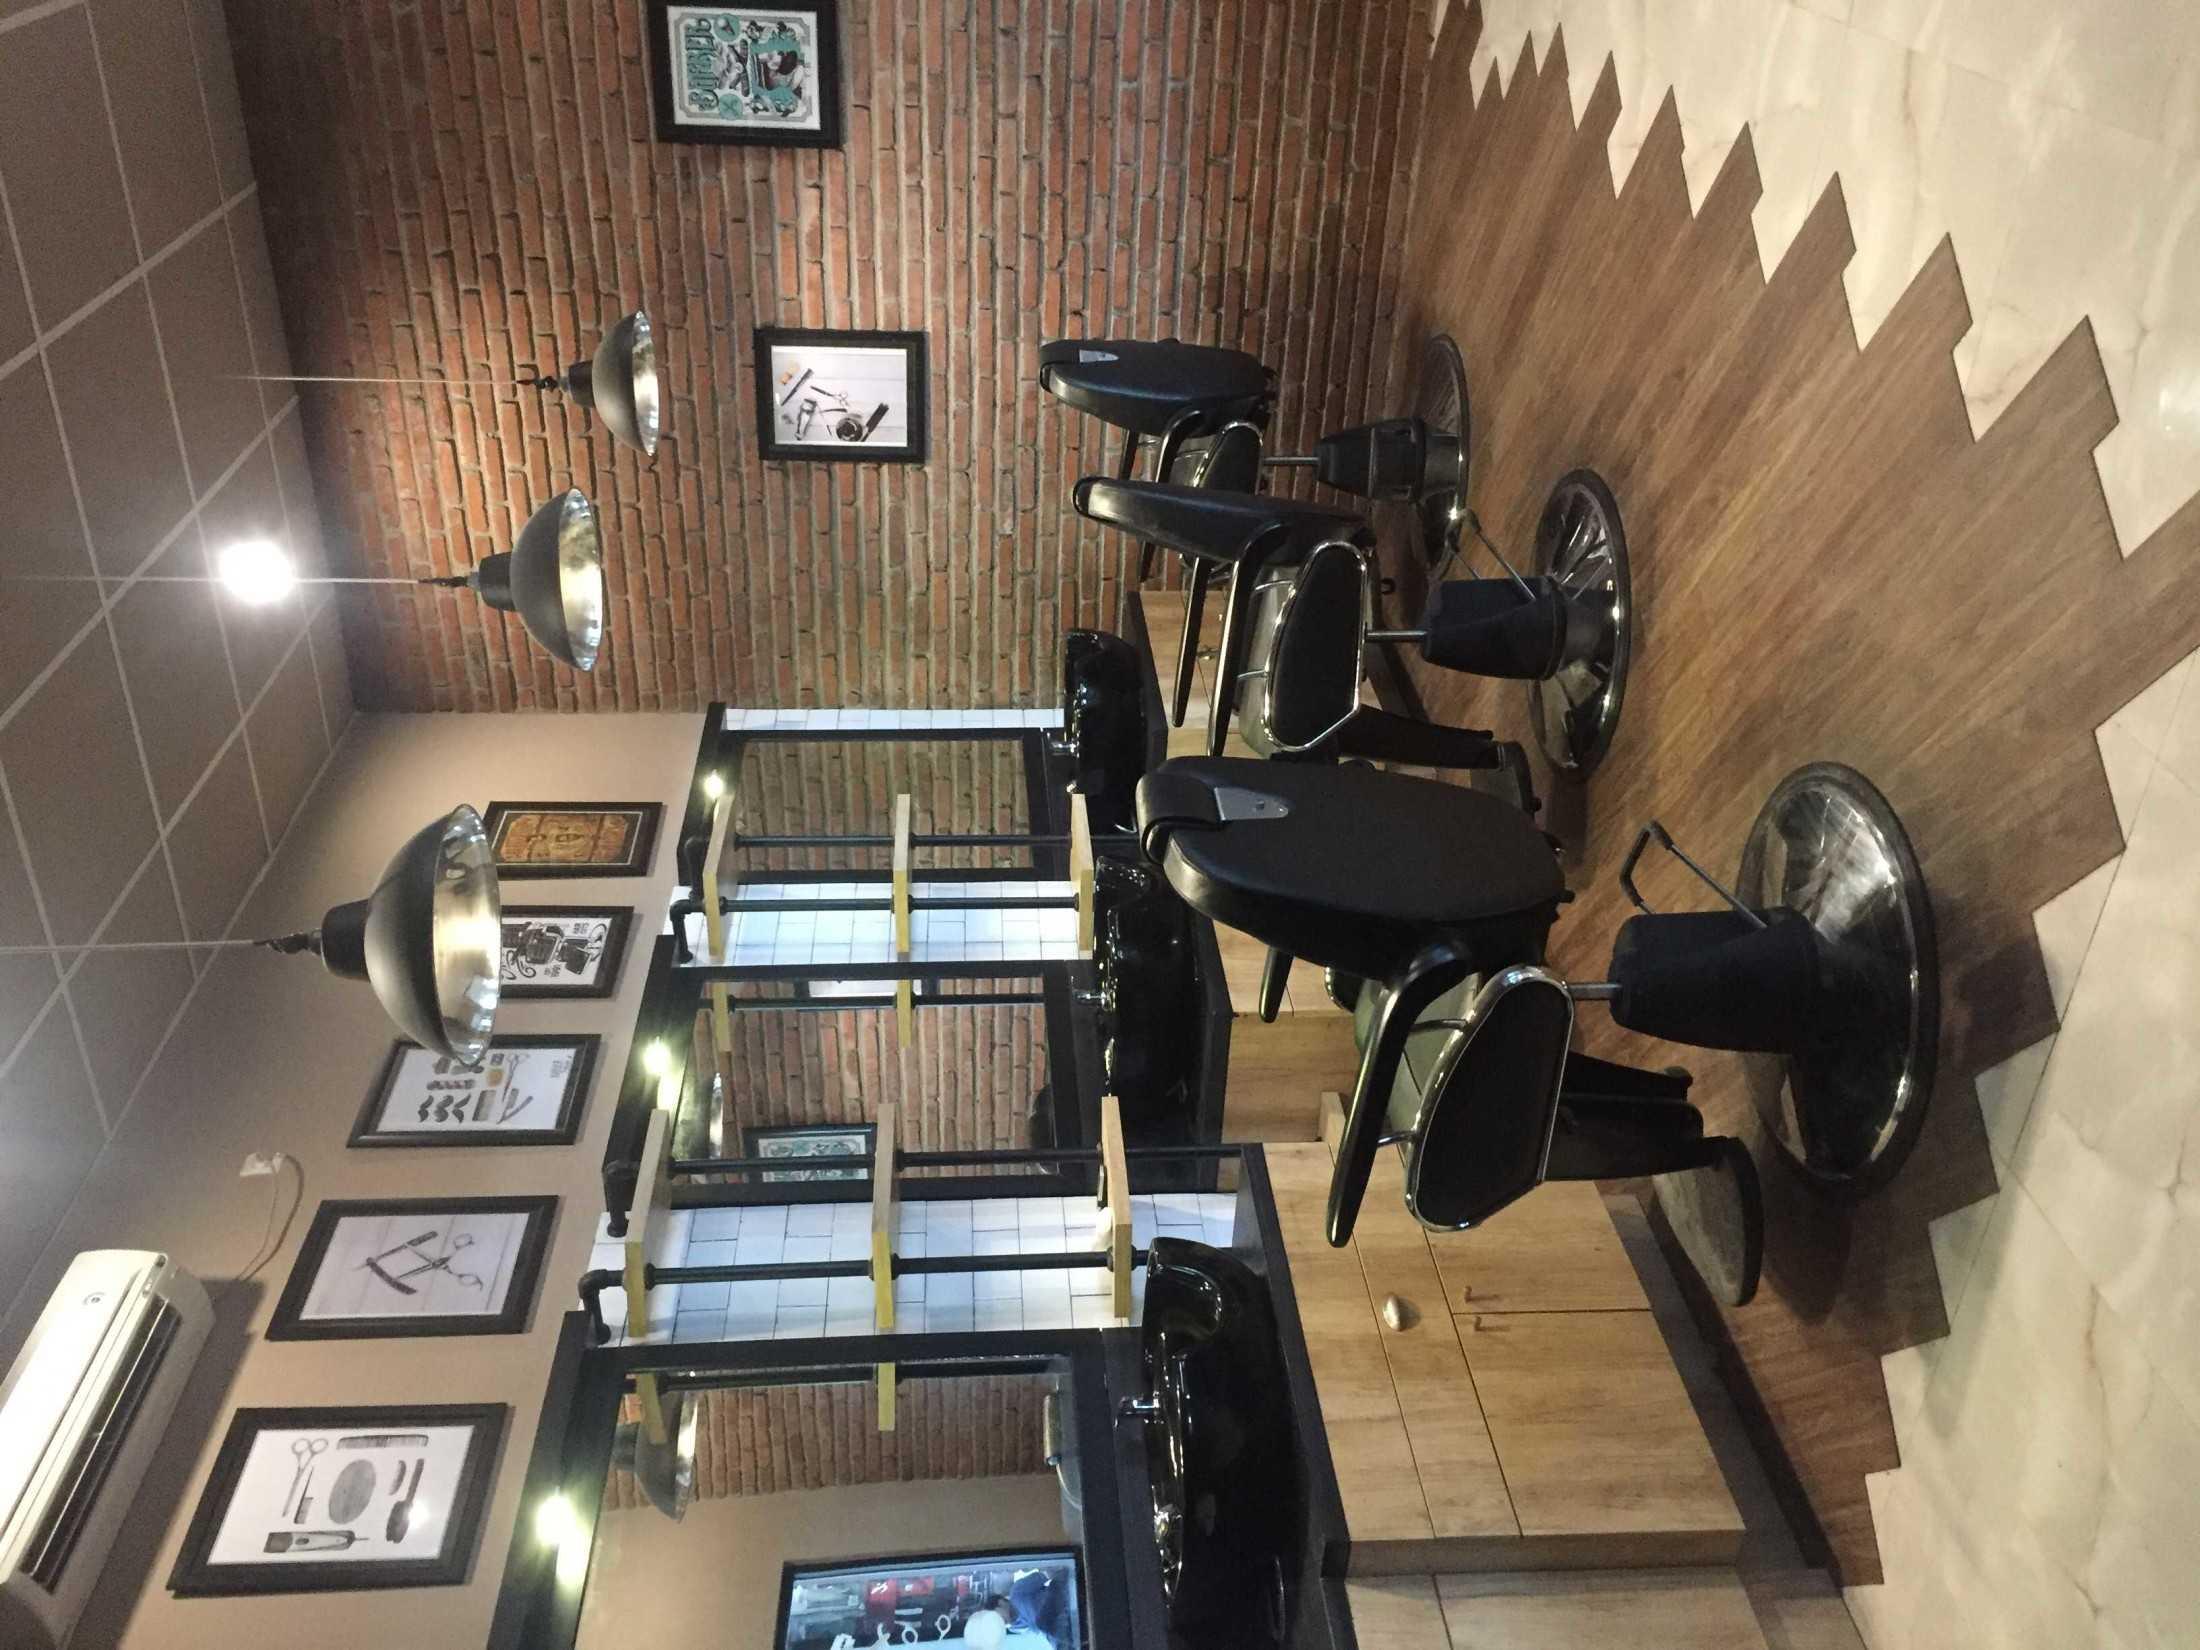 Aditya Wira Hardi Design Interior Barbershop Kabupaten Sidoarjo, Jawa Timur, Indonesia Kabupaten Sidoarjo, Jawa Timur, Indonesia Aditya-Wira-Hardi-Design-Interior-Barbershop  66092